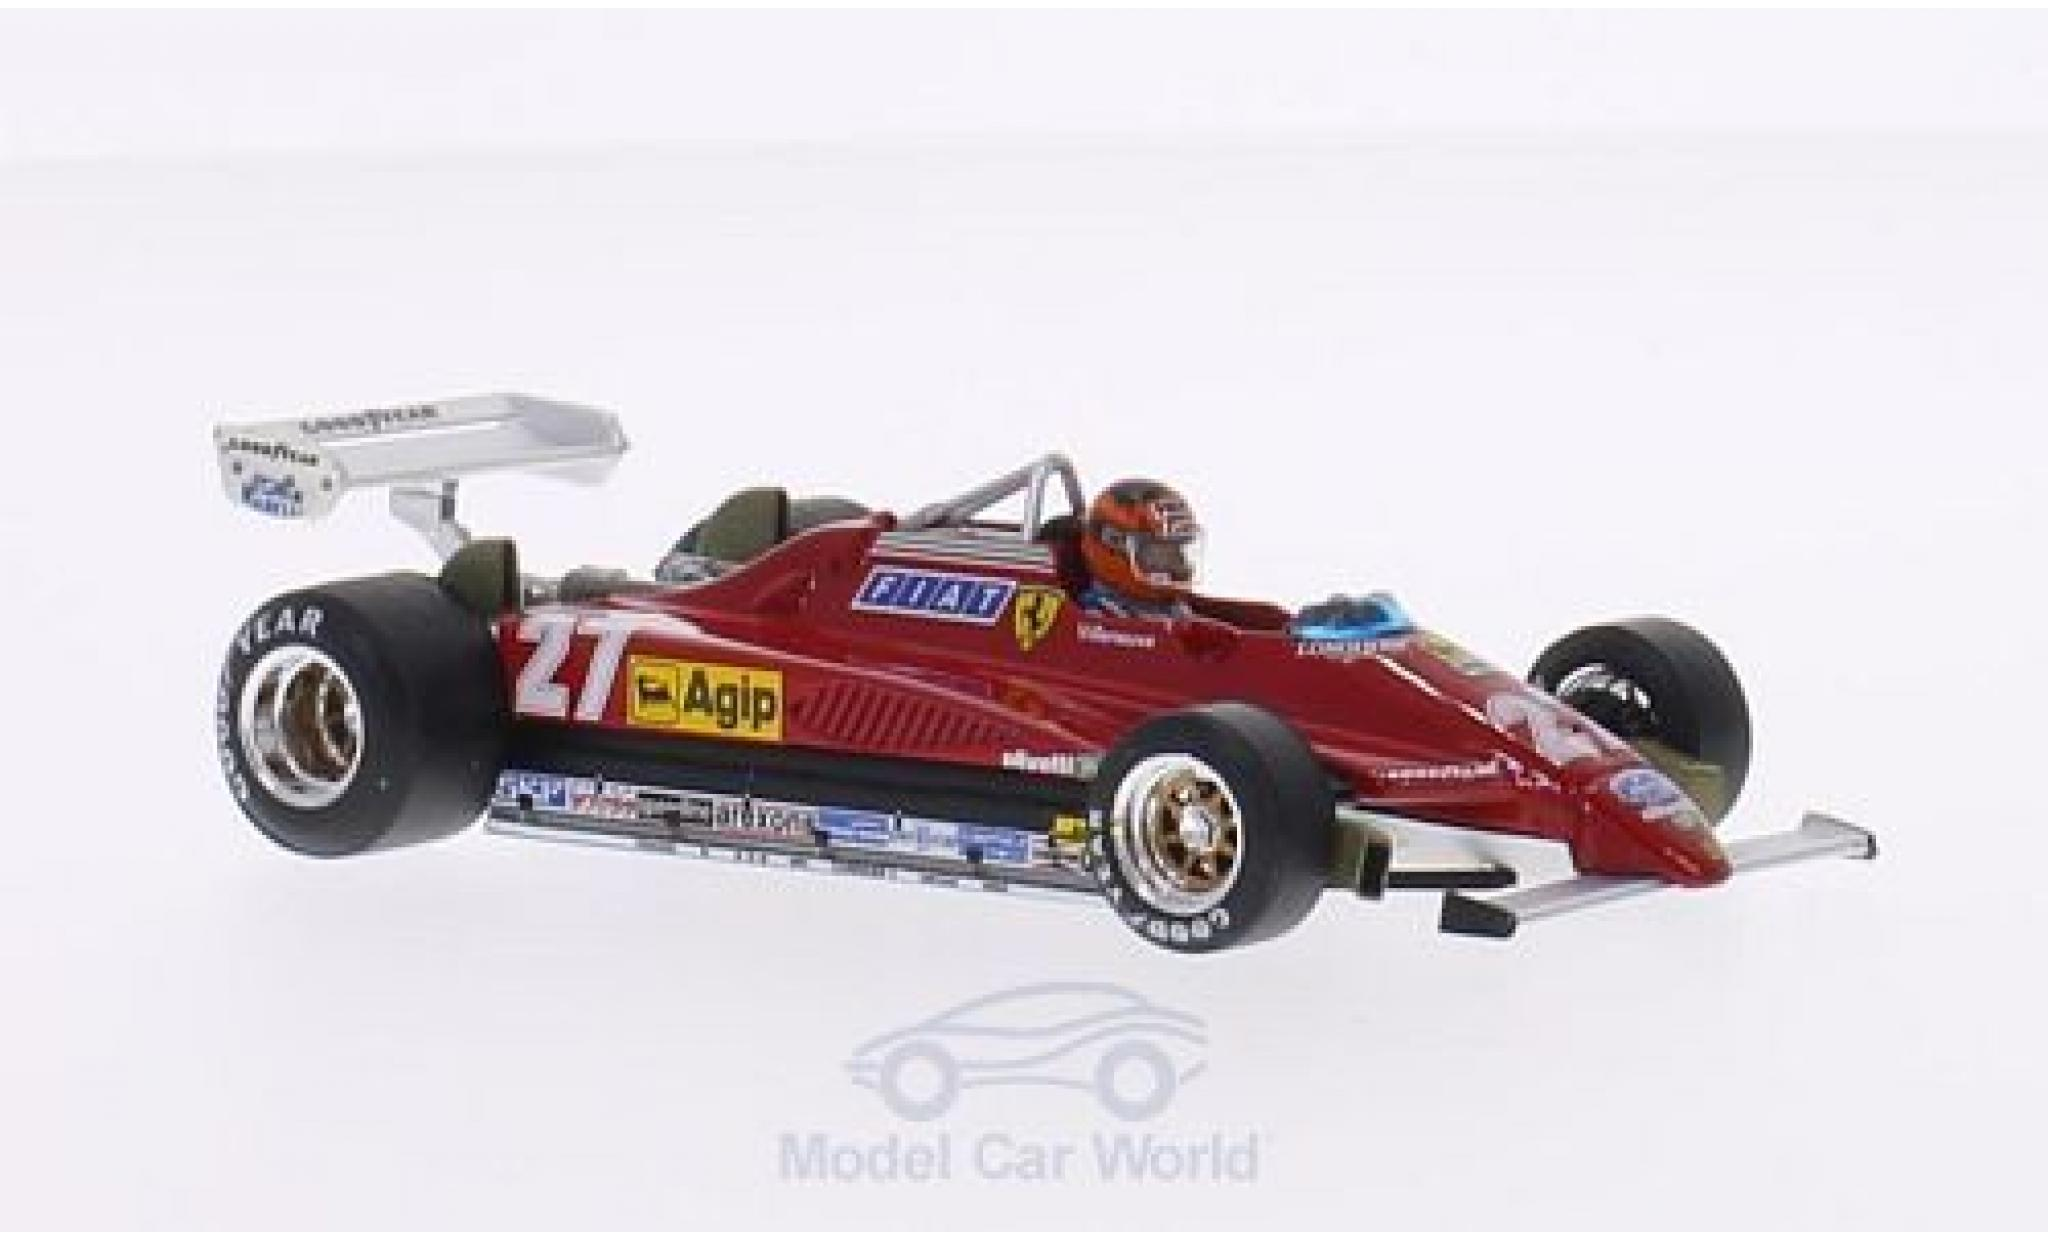 Ferrari 126 1/43 Brumm C2 Turbo No.27 Scuderia Formel 1 GP Belgien 1982 mit Fahrerfigur in Sonderverpackung G.Villeneuve